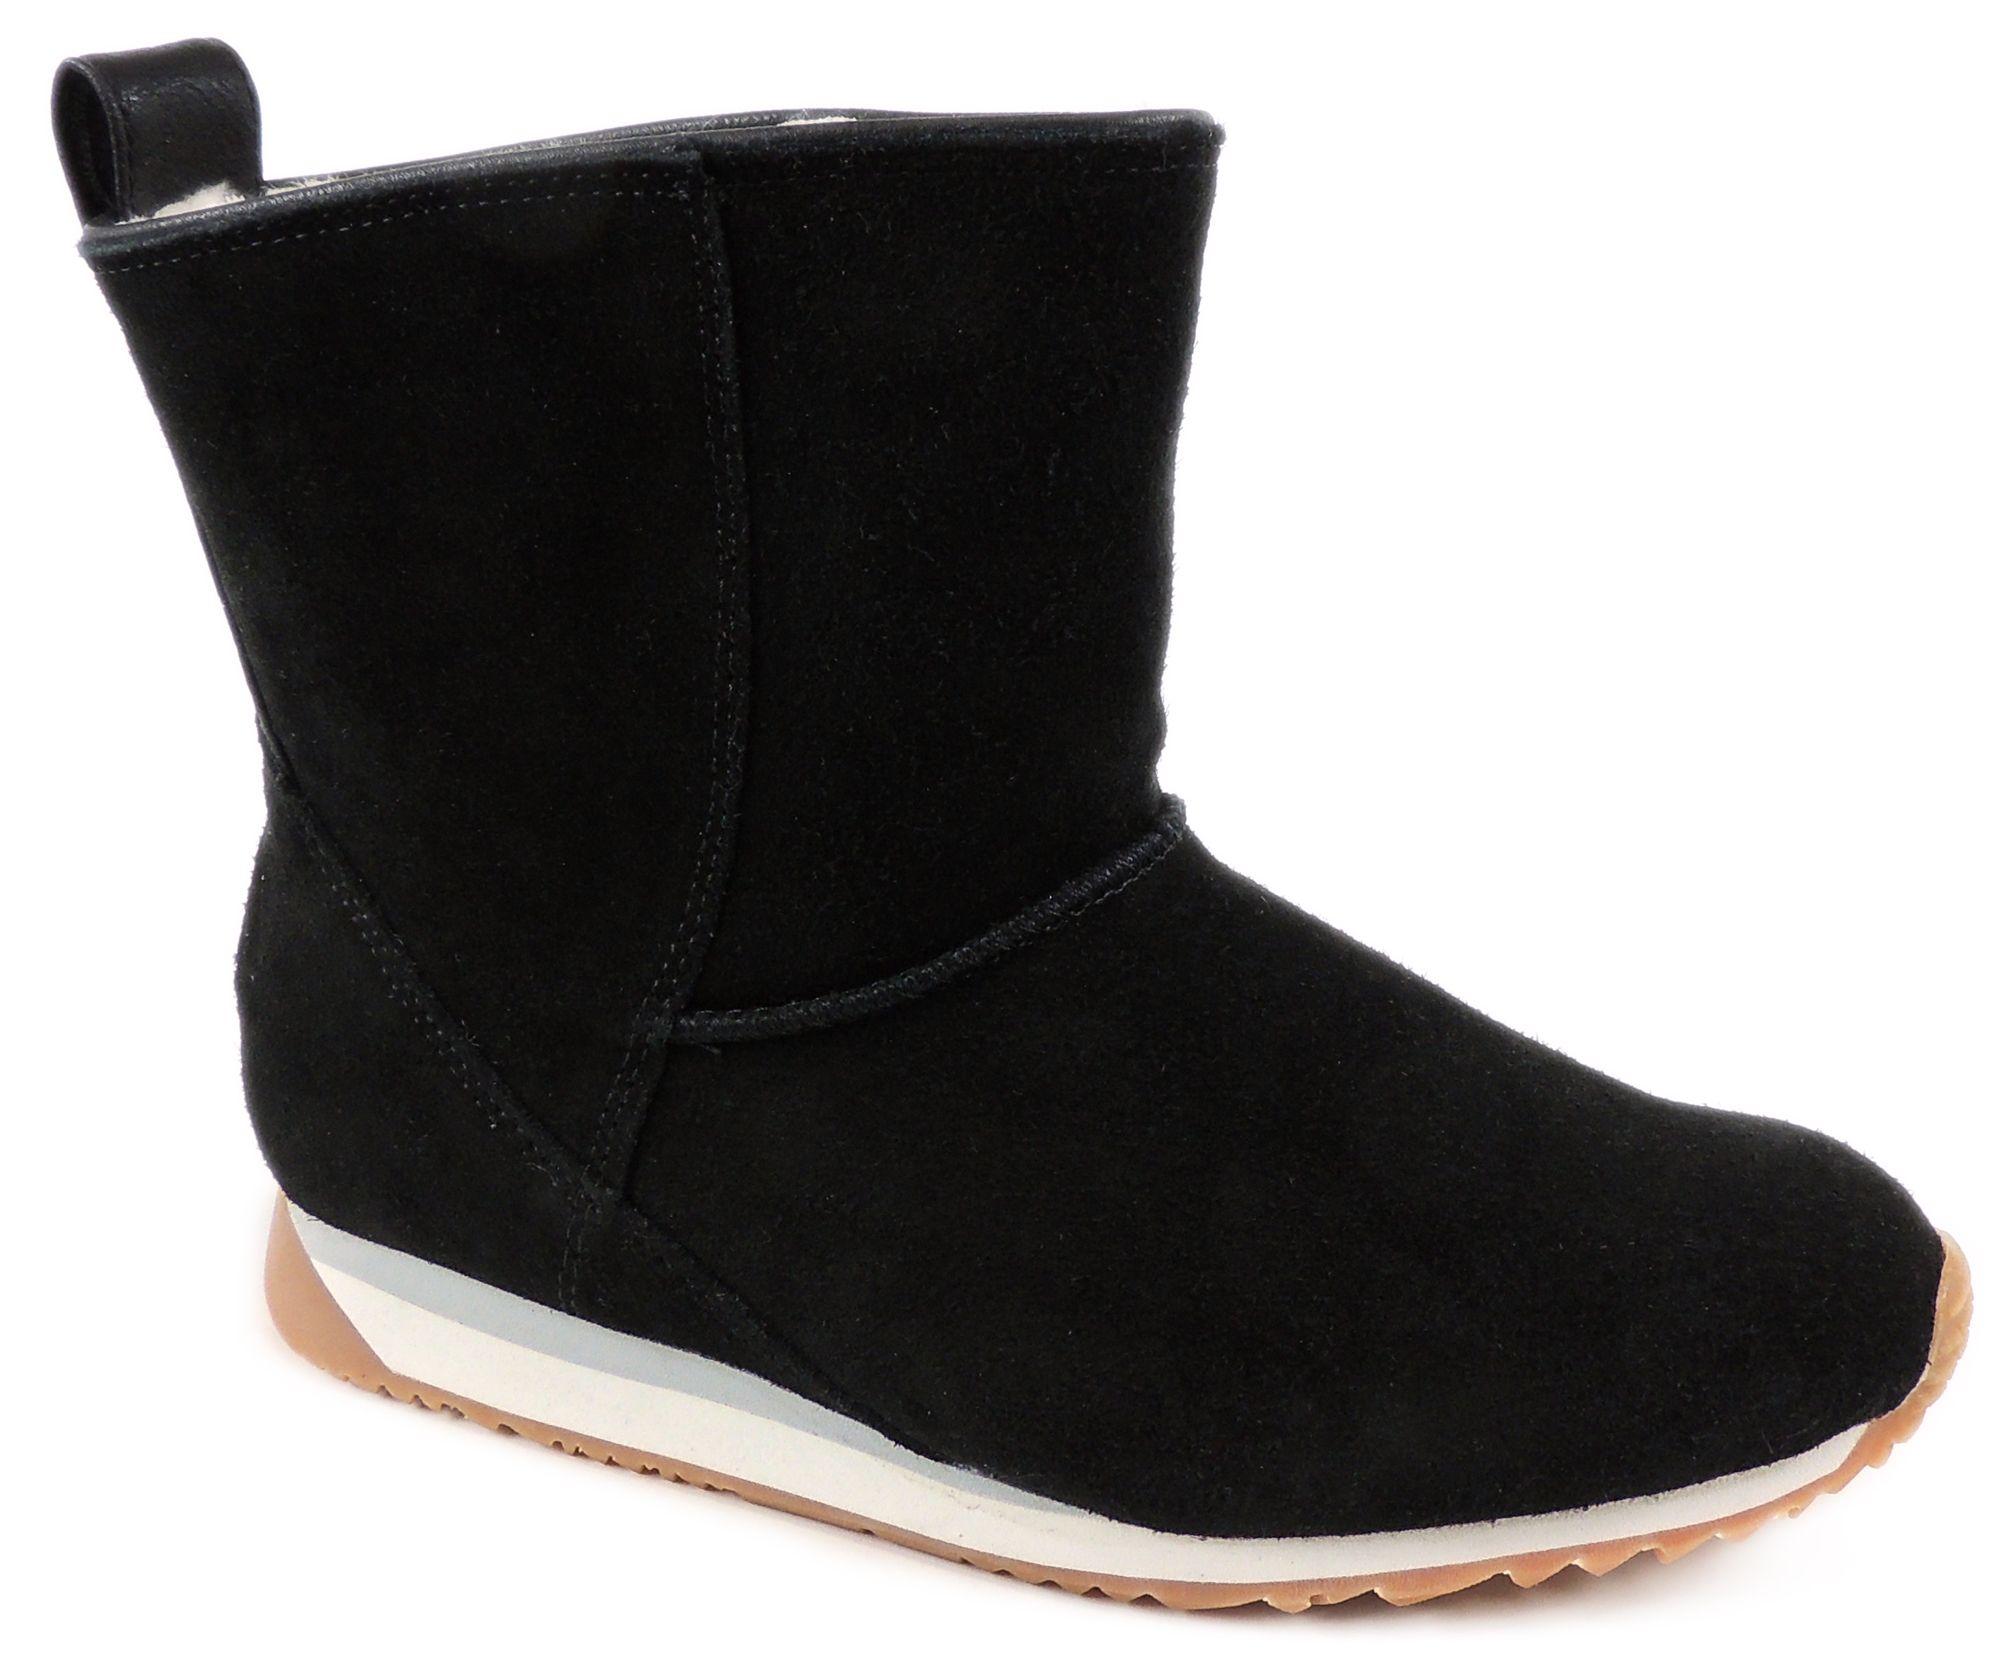 Botki Emu 3580140d Botki Damskie Intershoe Com Pl Boots Ugg Boots Shoes